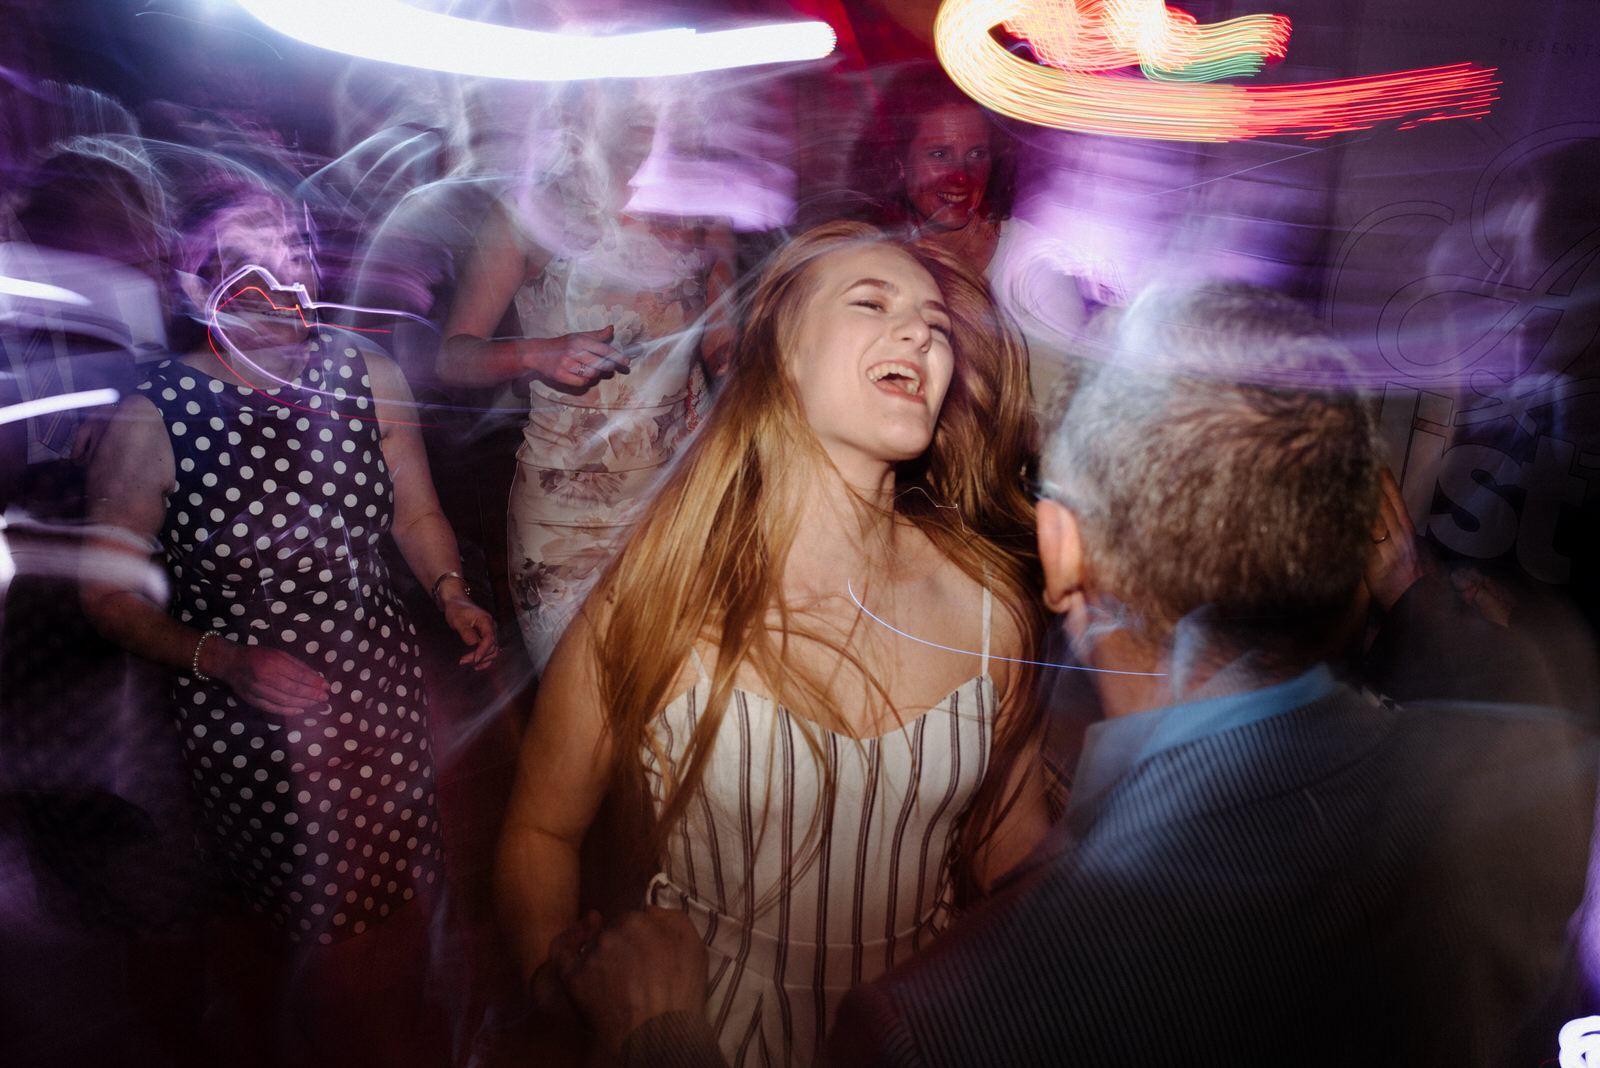 Covid Safe DJs help partying return